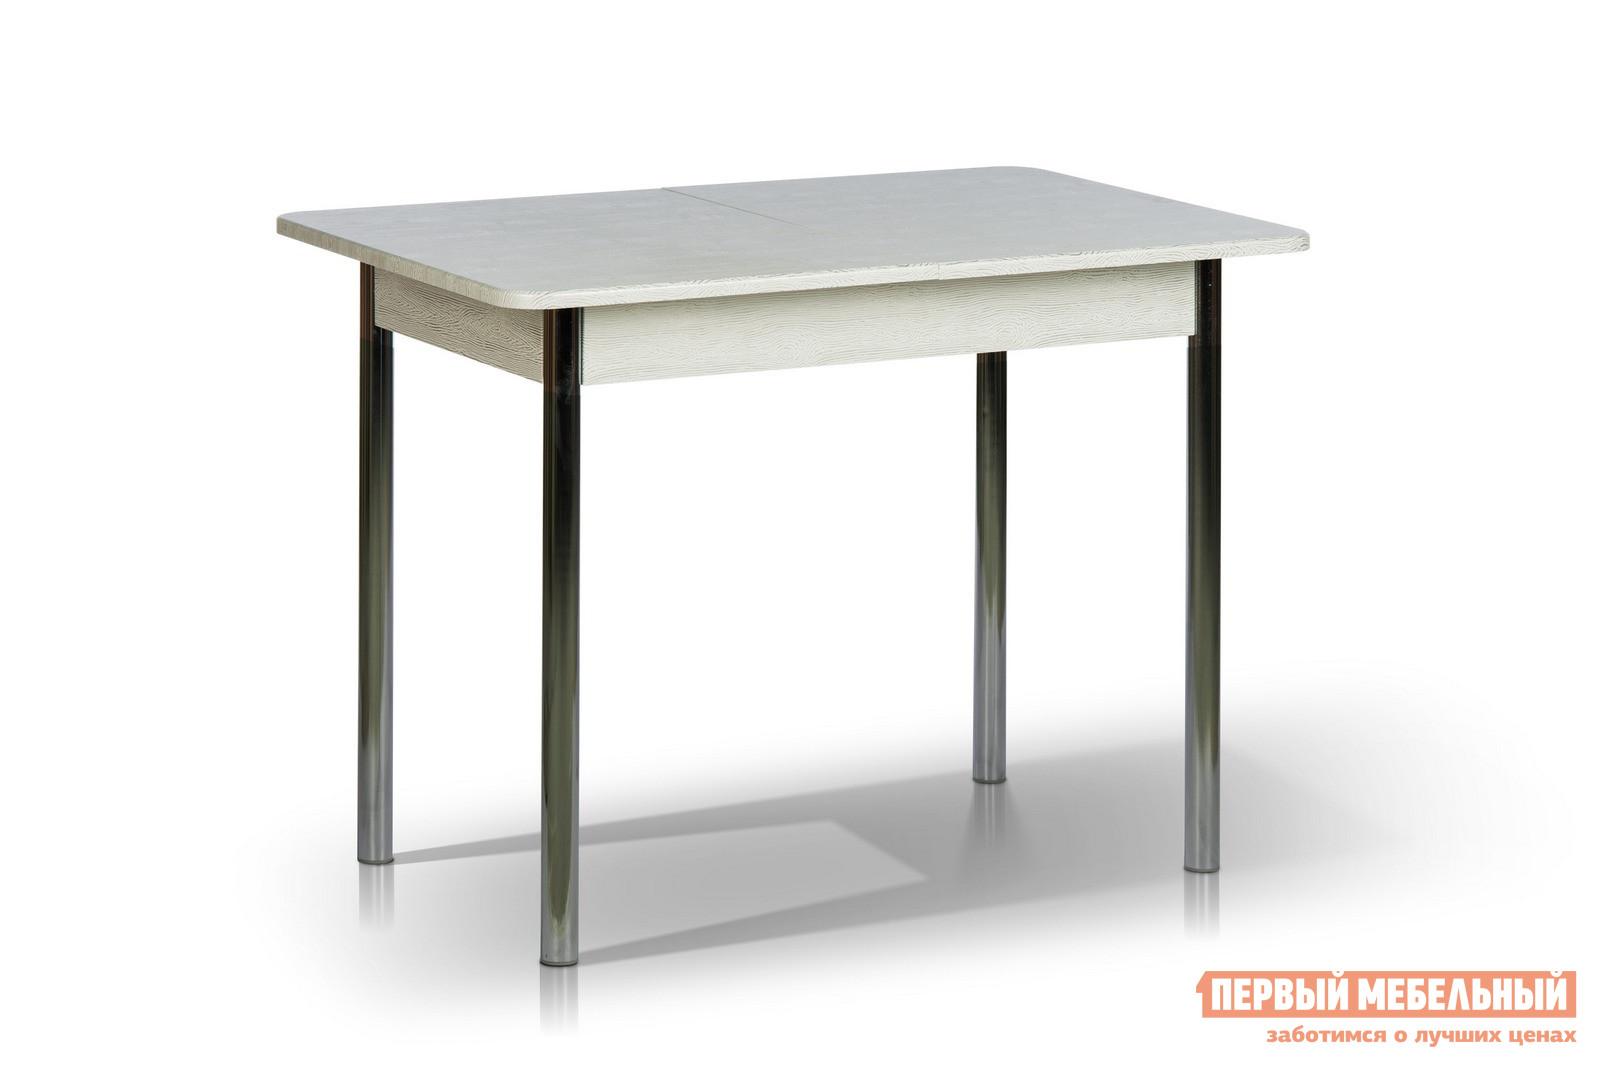 Кухонный стол МегаЭлатон Капри Мини Дуб белый патина